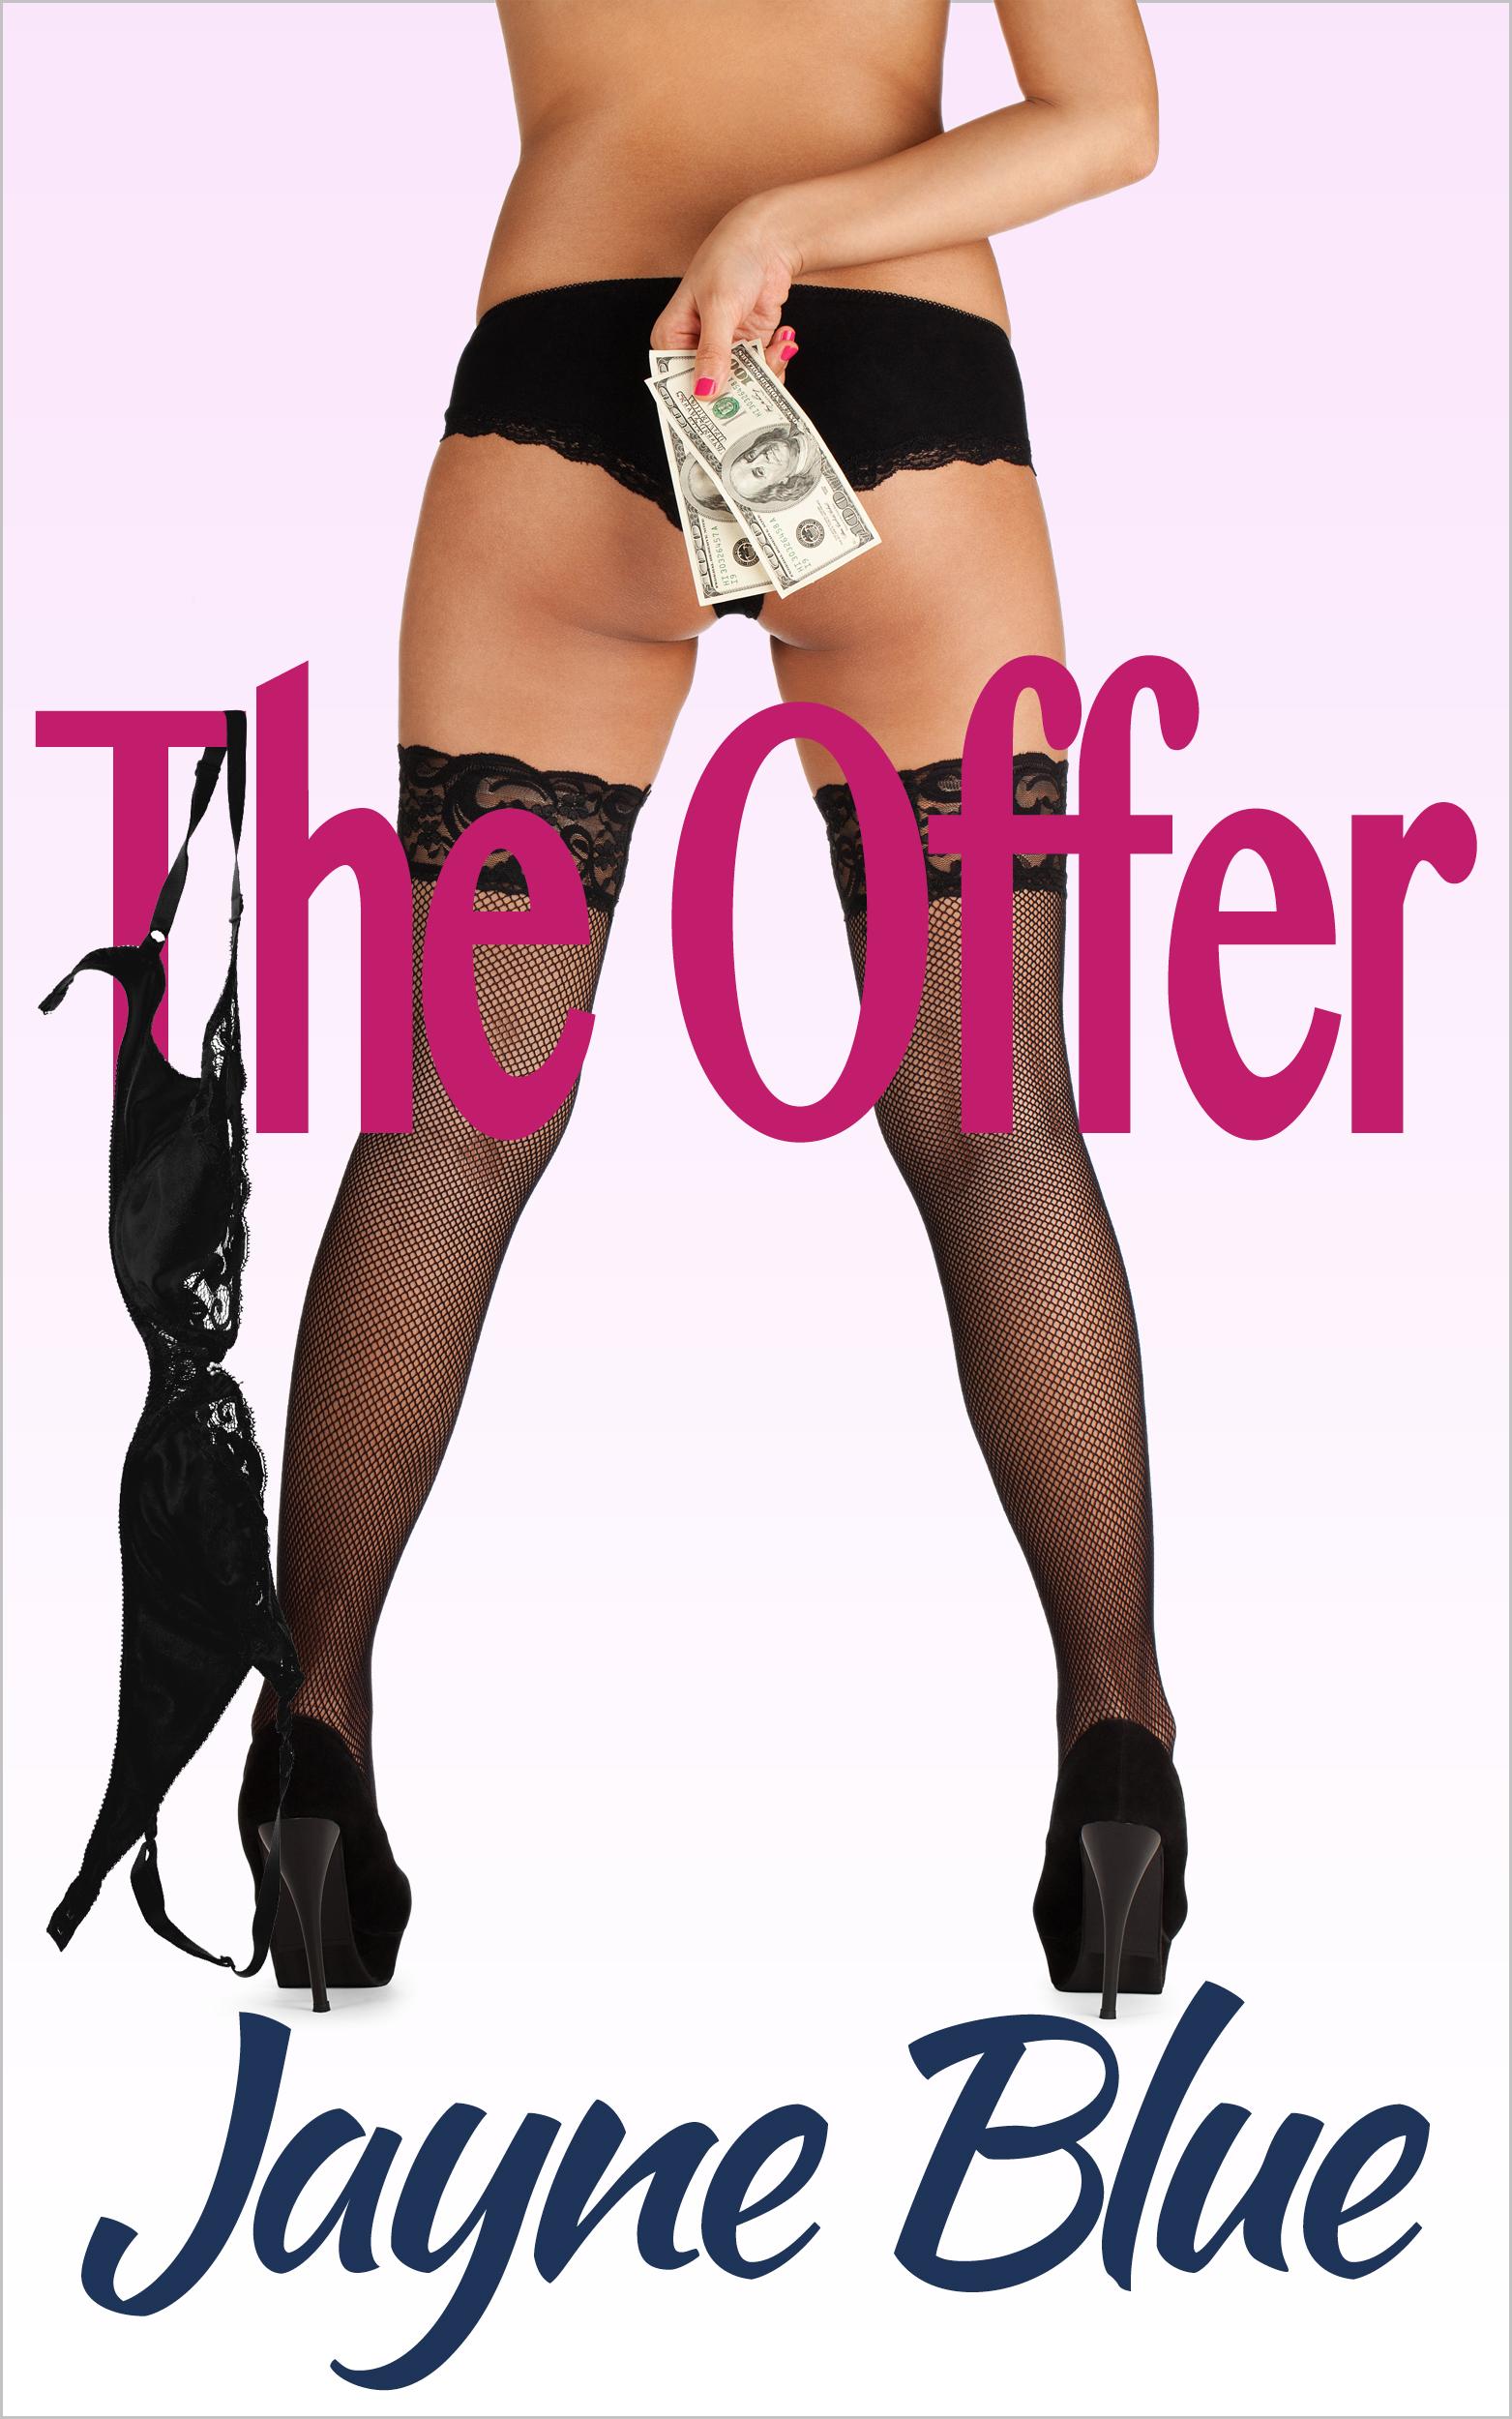 Jayne Blue - The Offer (The Chronicles of Nina Sharpe, Call Girl: Book #1)